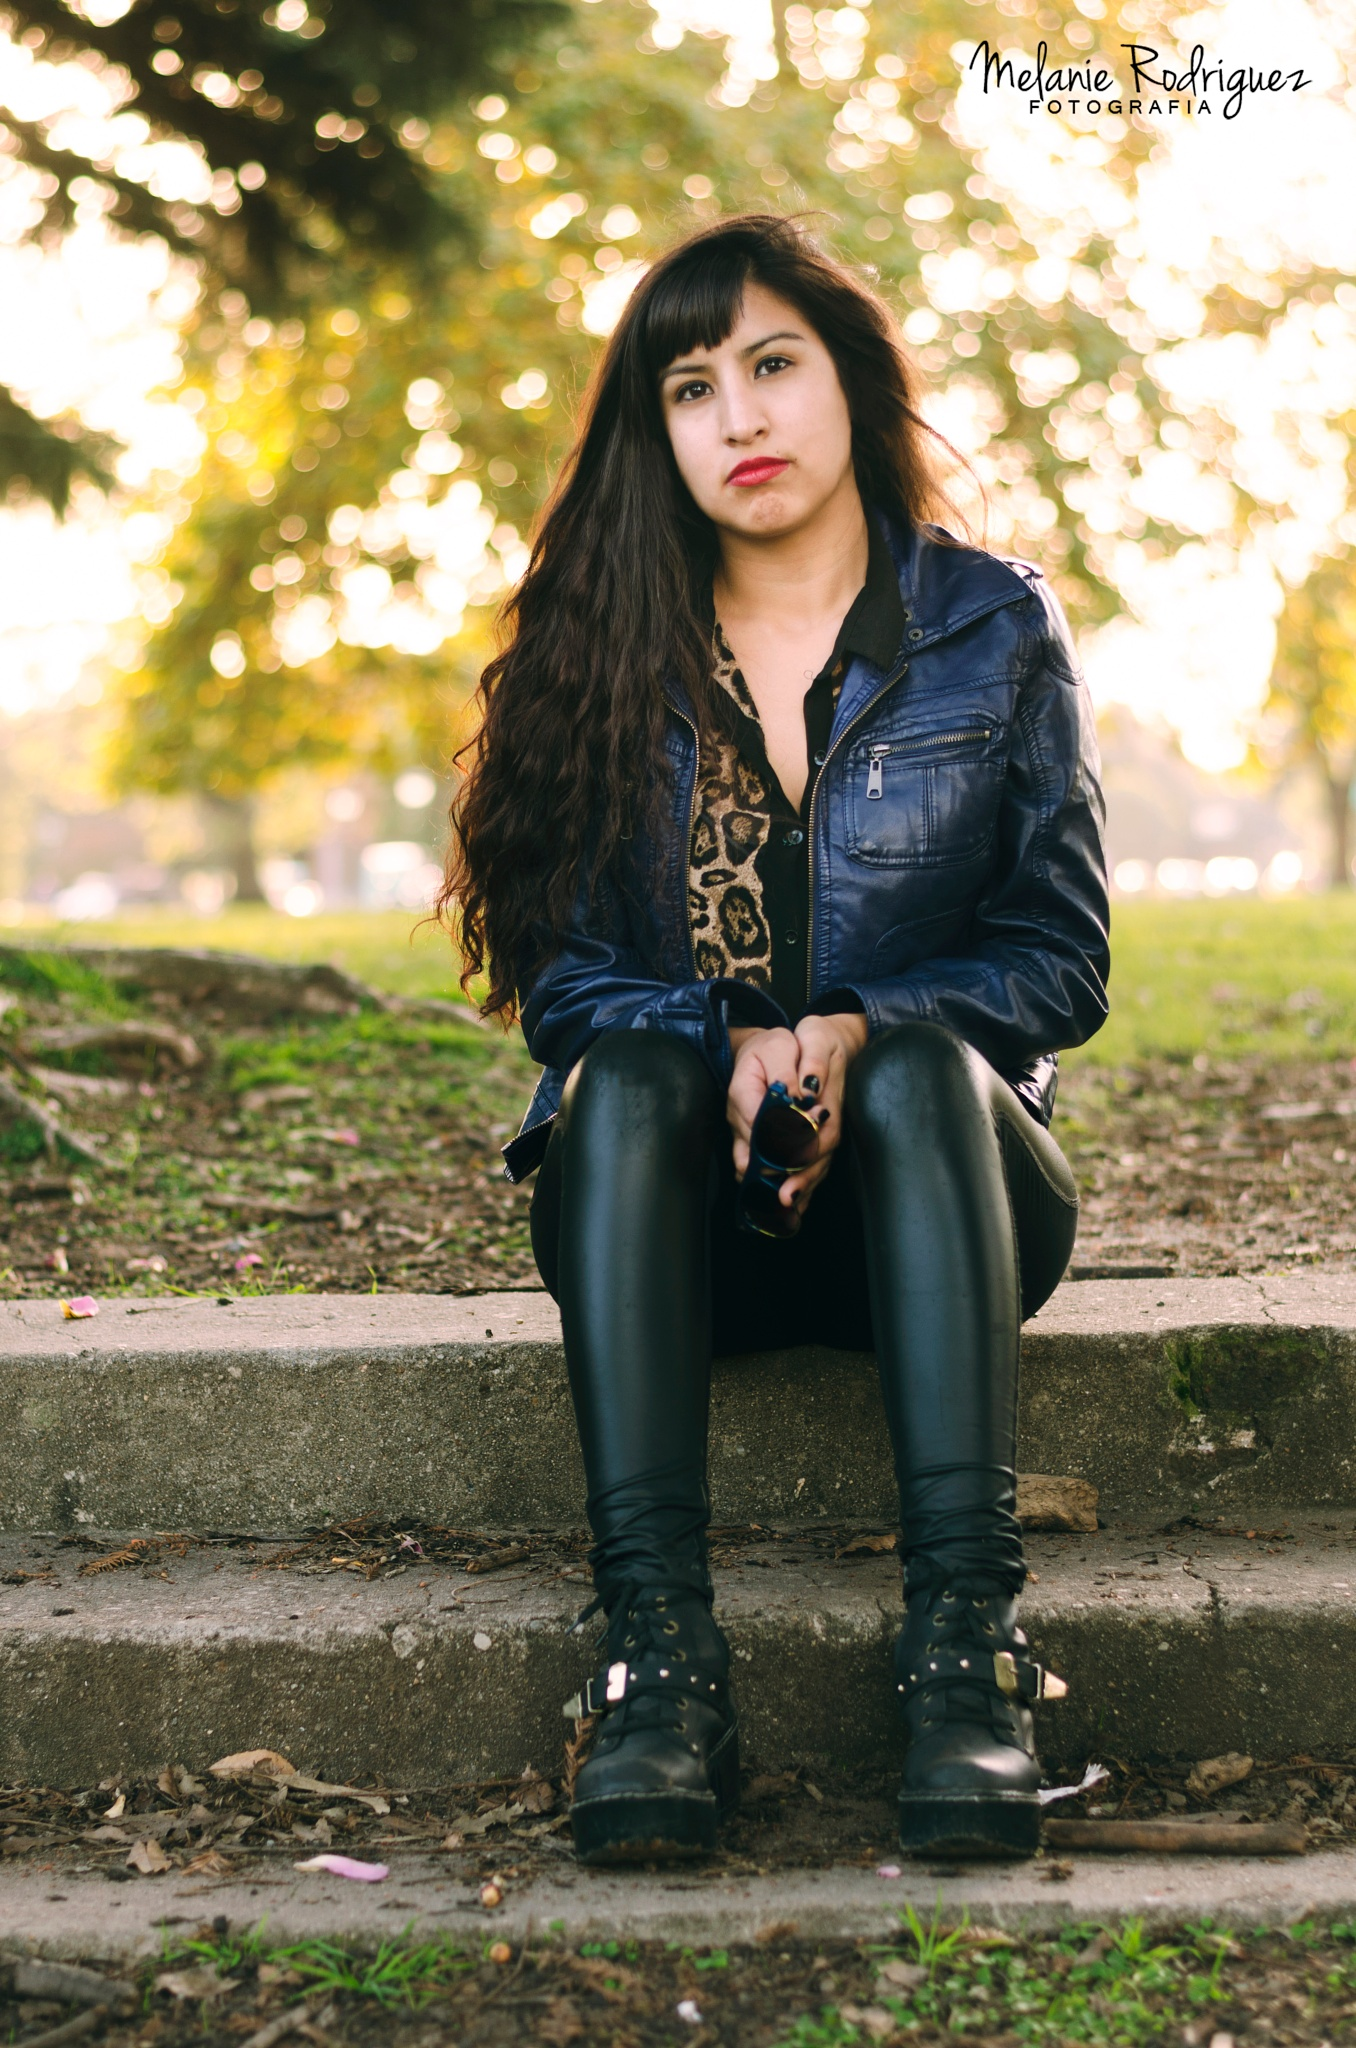 Brenda  by Melanie Rodriguez